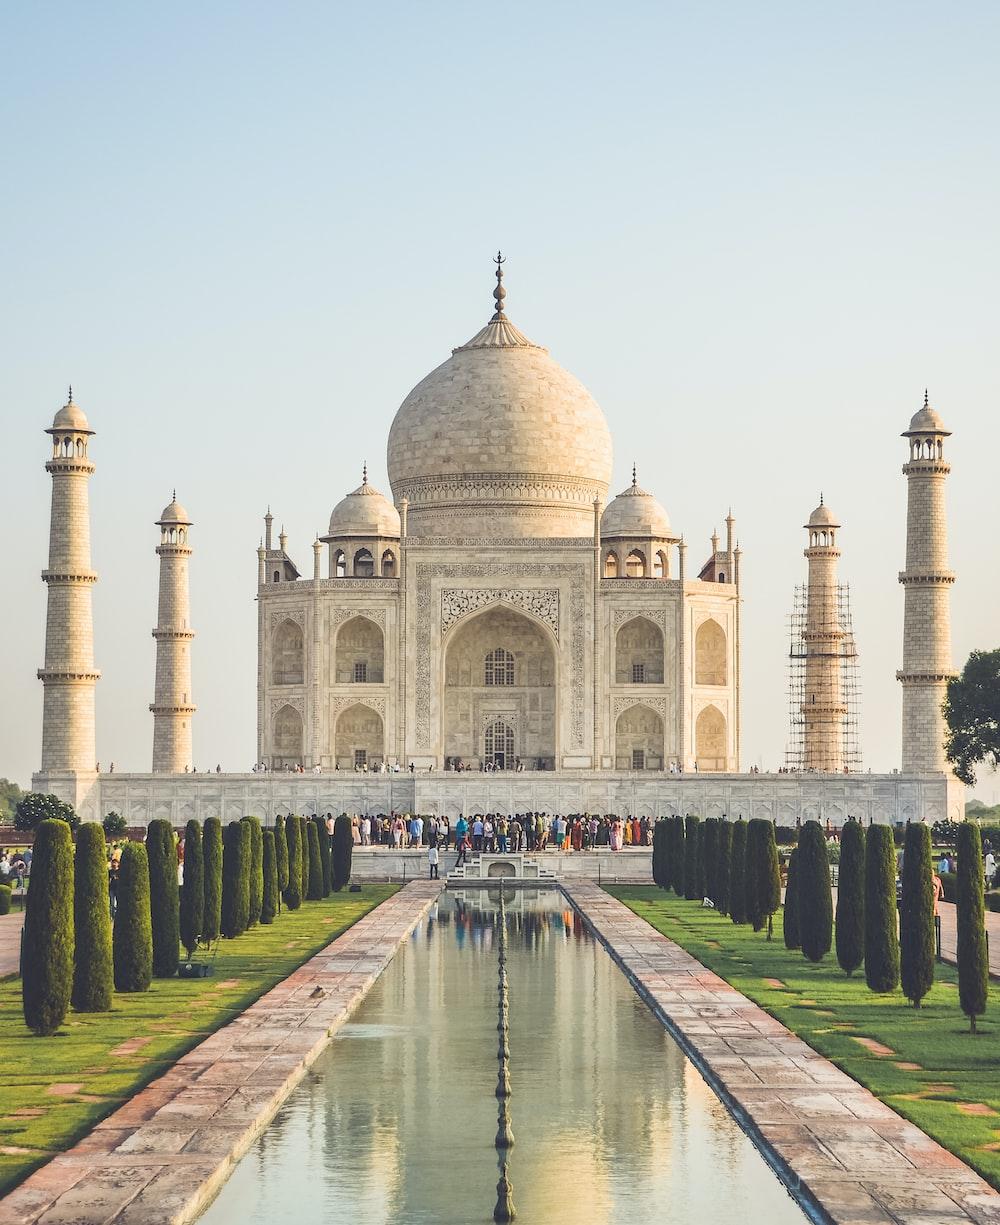 Taj Mahal Pictures [Scenic Travel Photos]